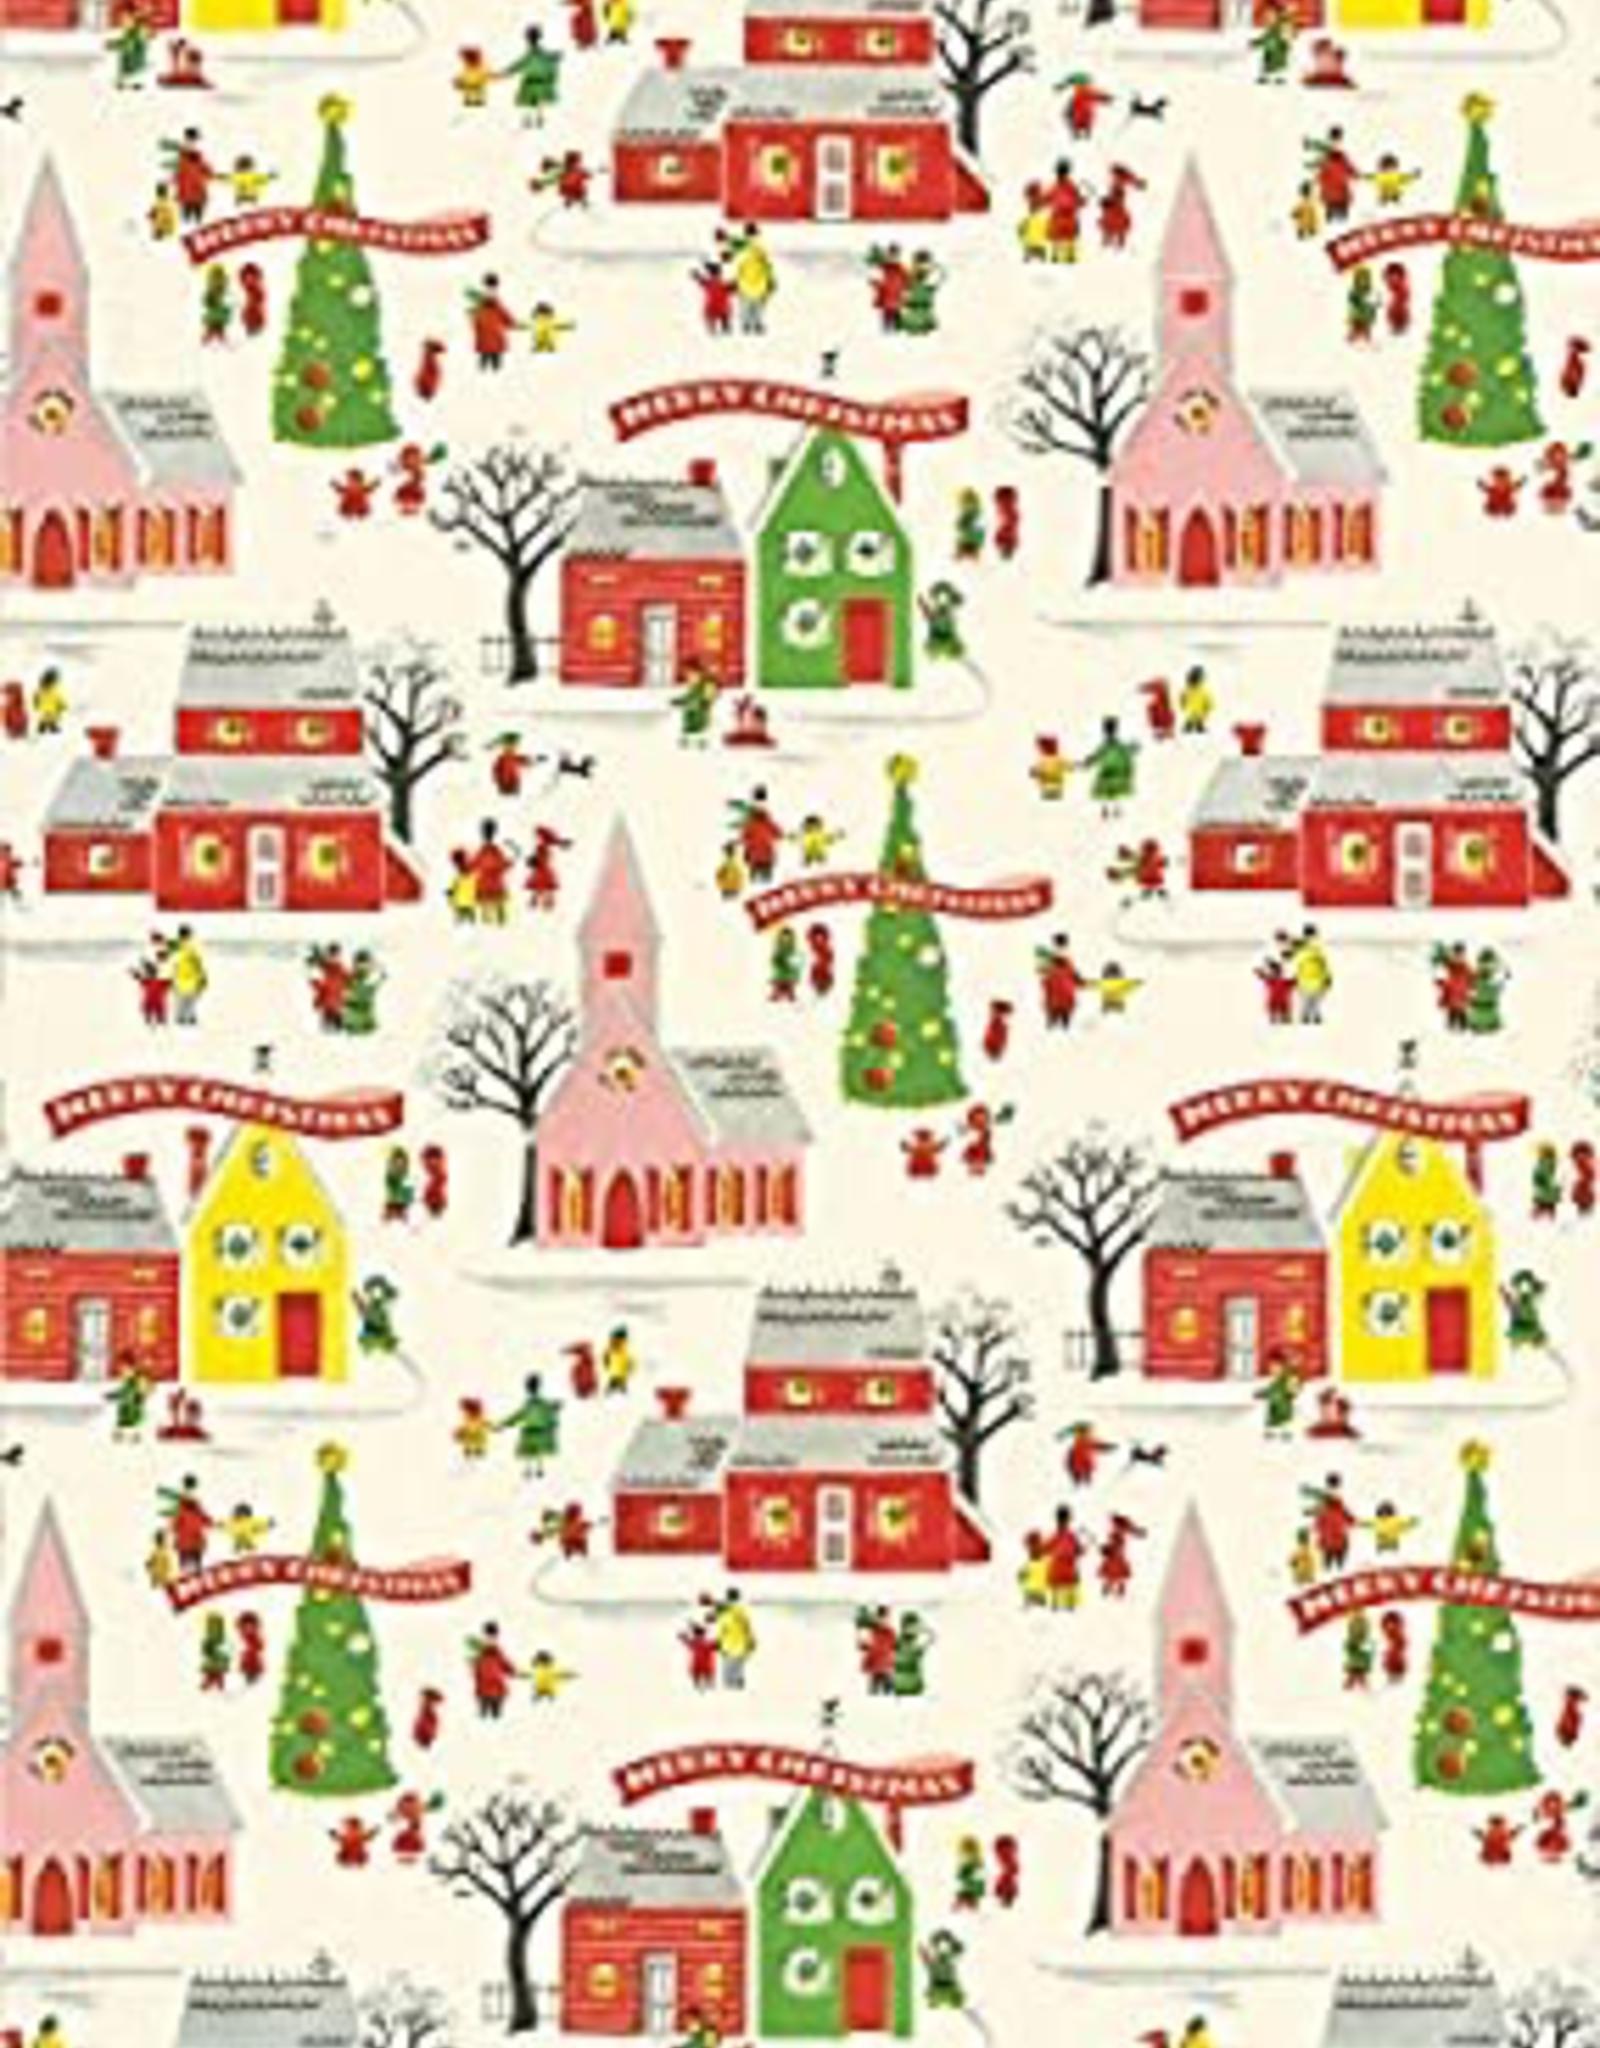 Cavallini Papers Cavallini Papers Christmas Village Wrap